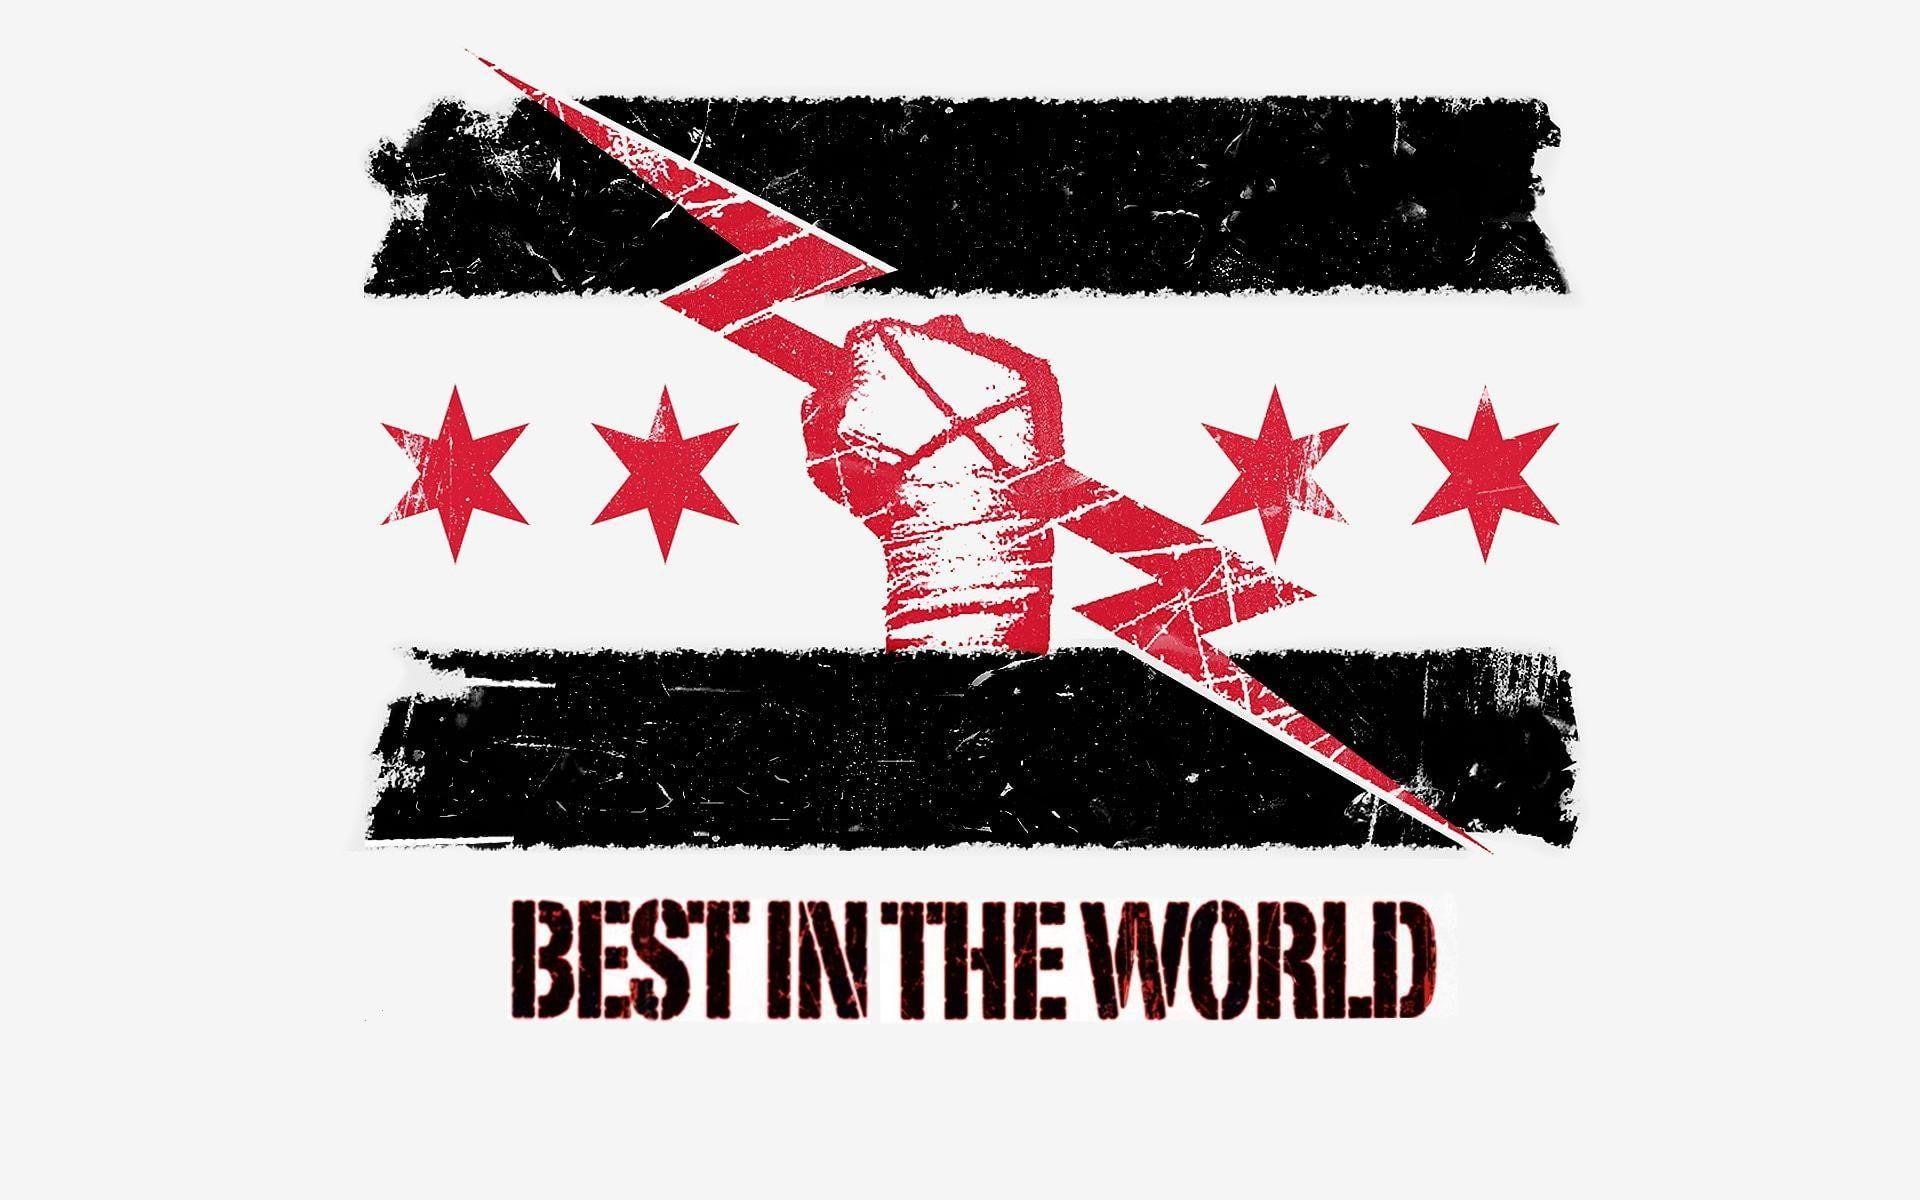 Wrestling Wwe World Wrestling Entertainment Logos Cm Punk Best In The World 1920x1200 Sports Wrestling Hd Art Wres Punk Wallpaper Cm Punk Entertainment Logo